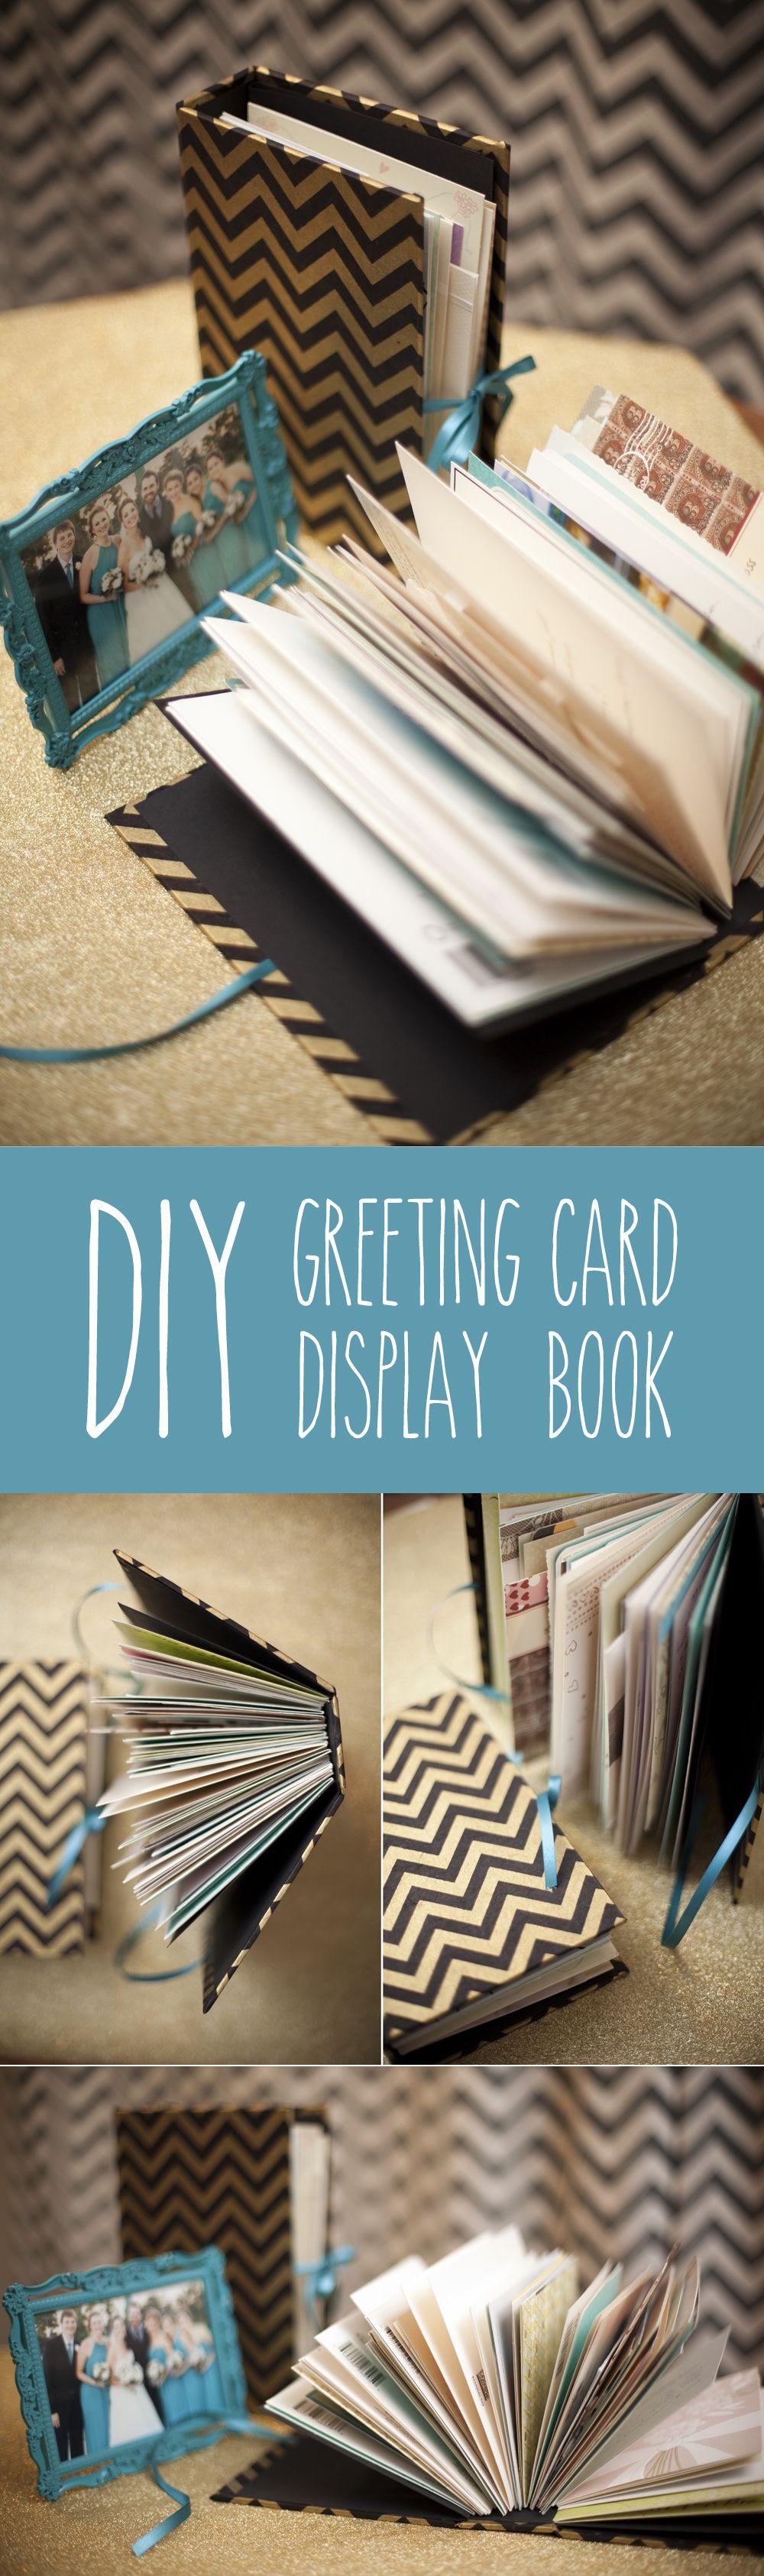 Turn Greeting Cards Into Book Austin Wedding Photography Dreamy Elk Photography Design Llc Wedding Cards Keepsake Diy Book Greeting Card Book